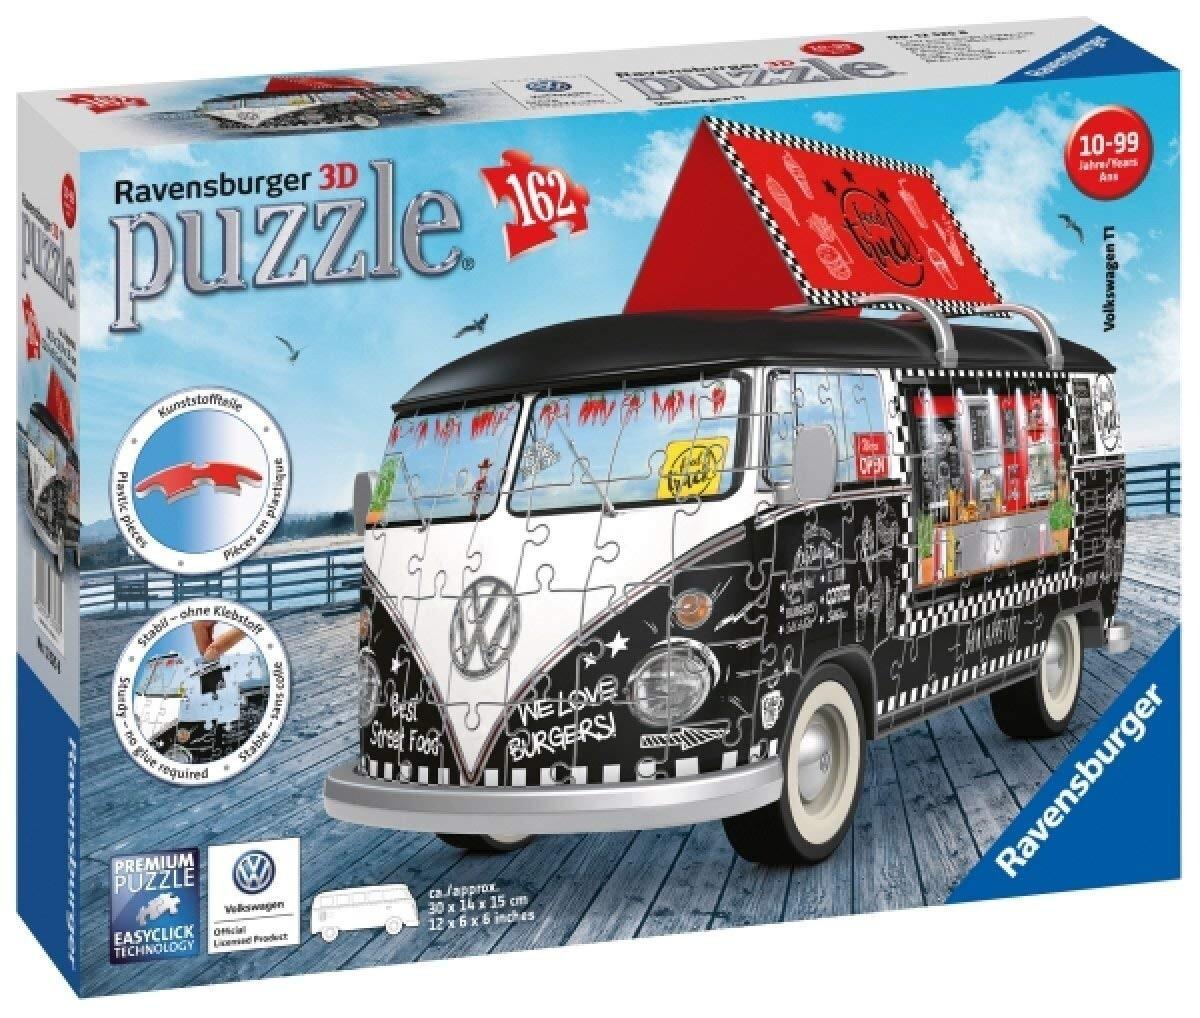 Ravensburger Puzzle - 3D Puzzle - Volkswagen T1 - Food Truck, 162 Teile als Spielware